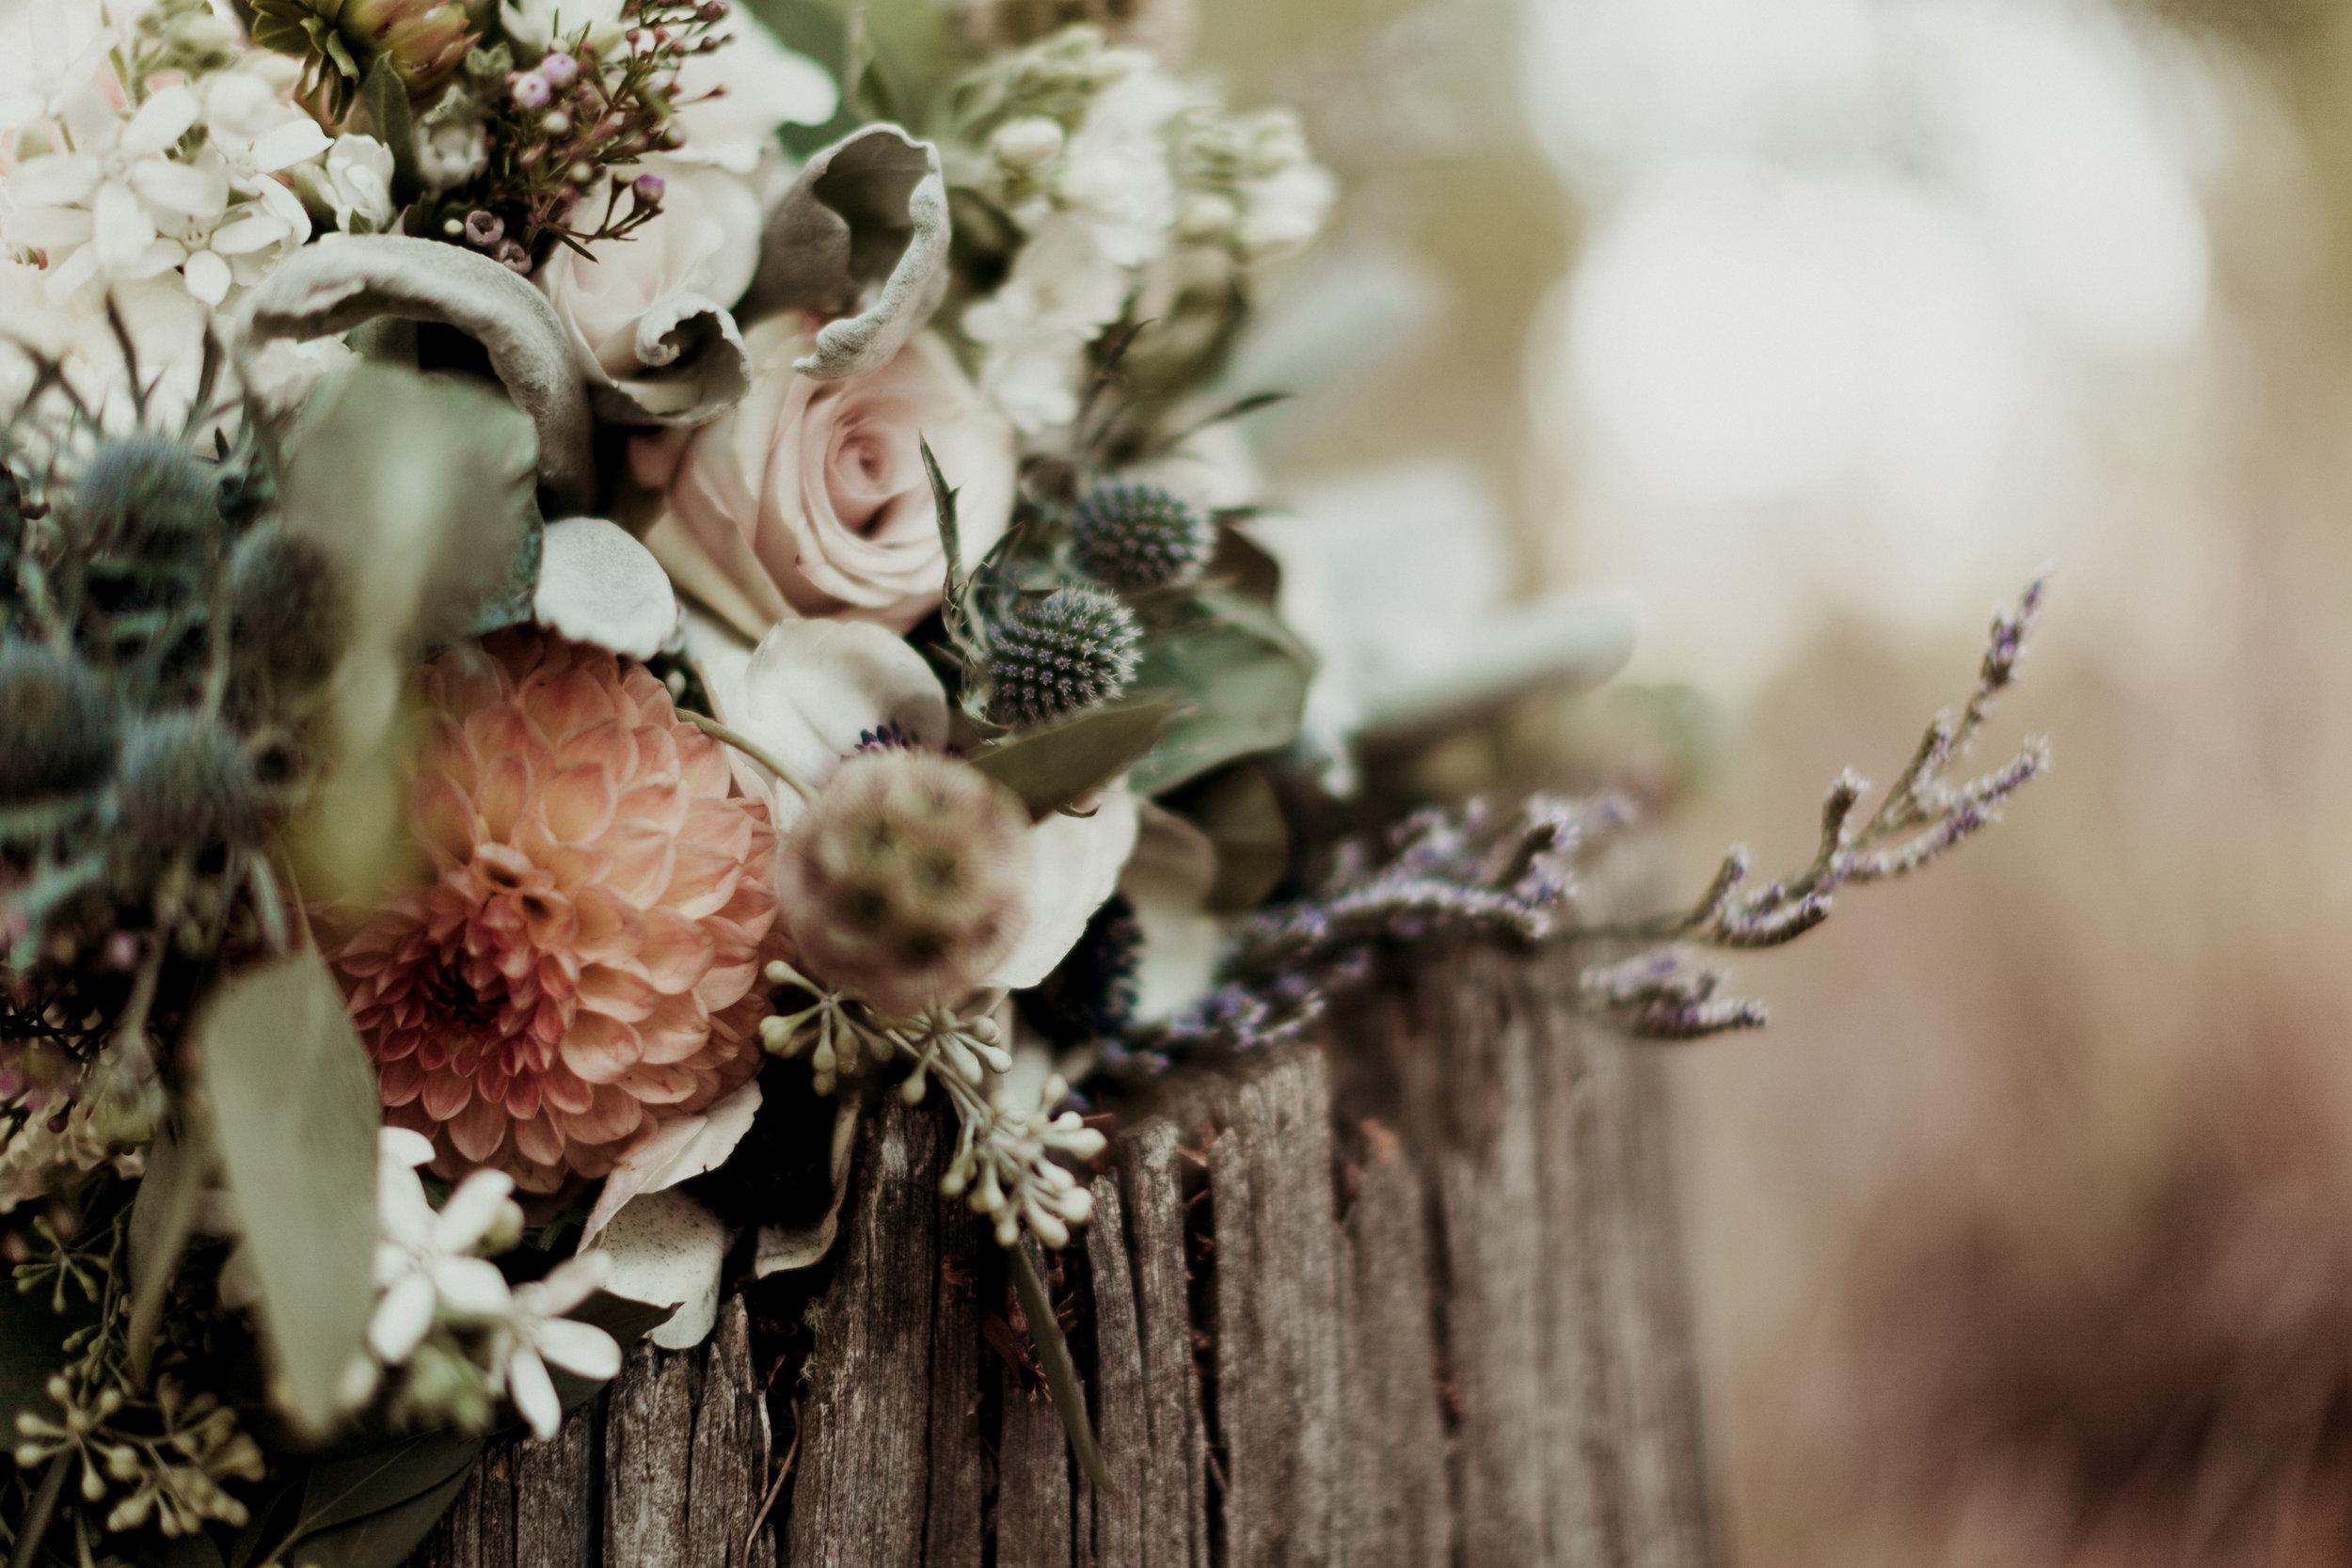 nature weddings florals bloom generation